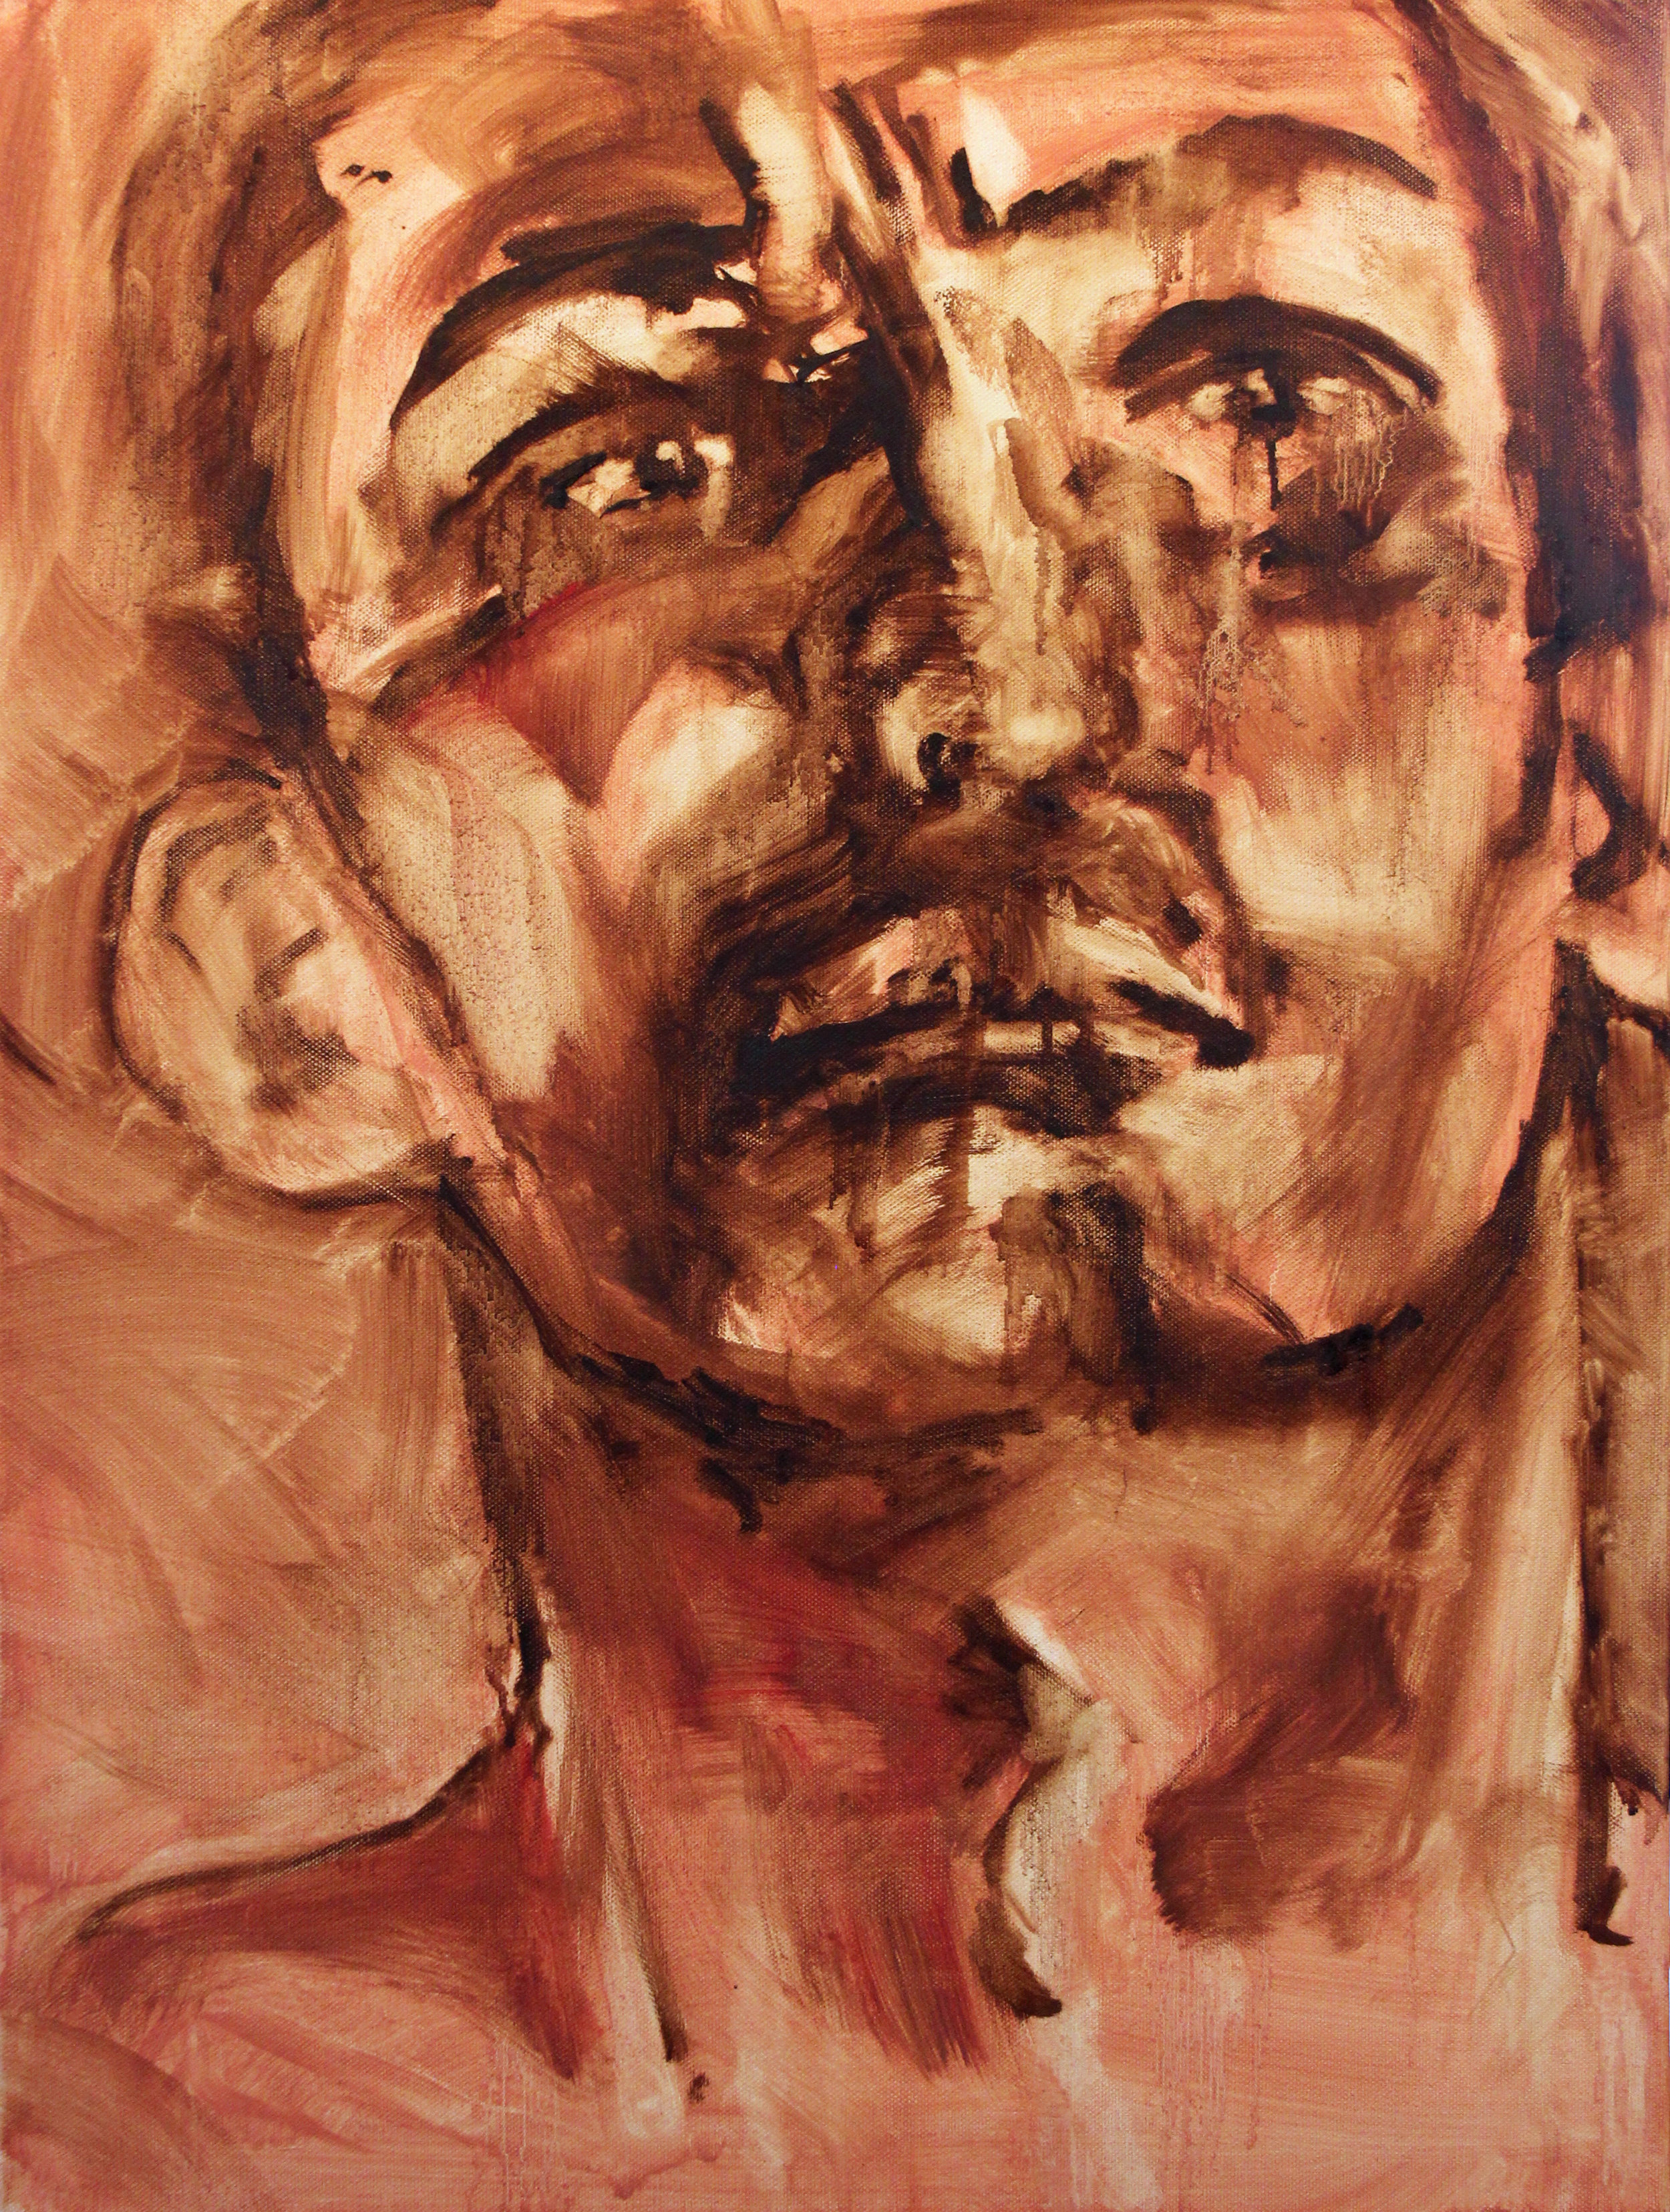 Tee Oil on Canvas 18x24  $600